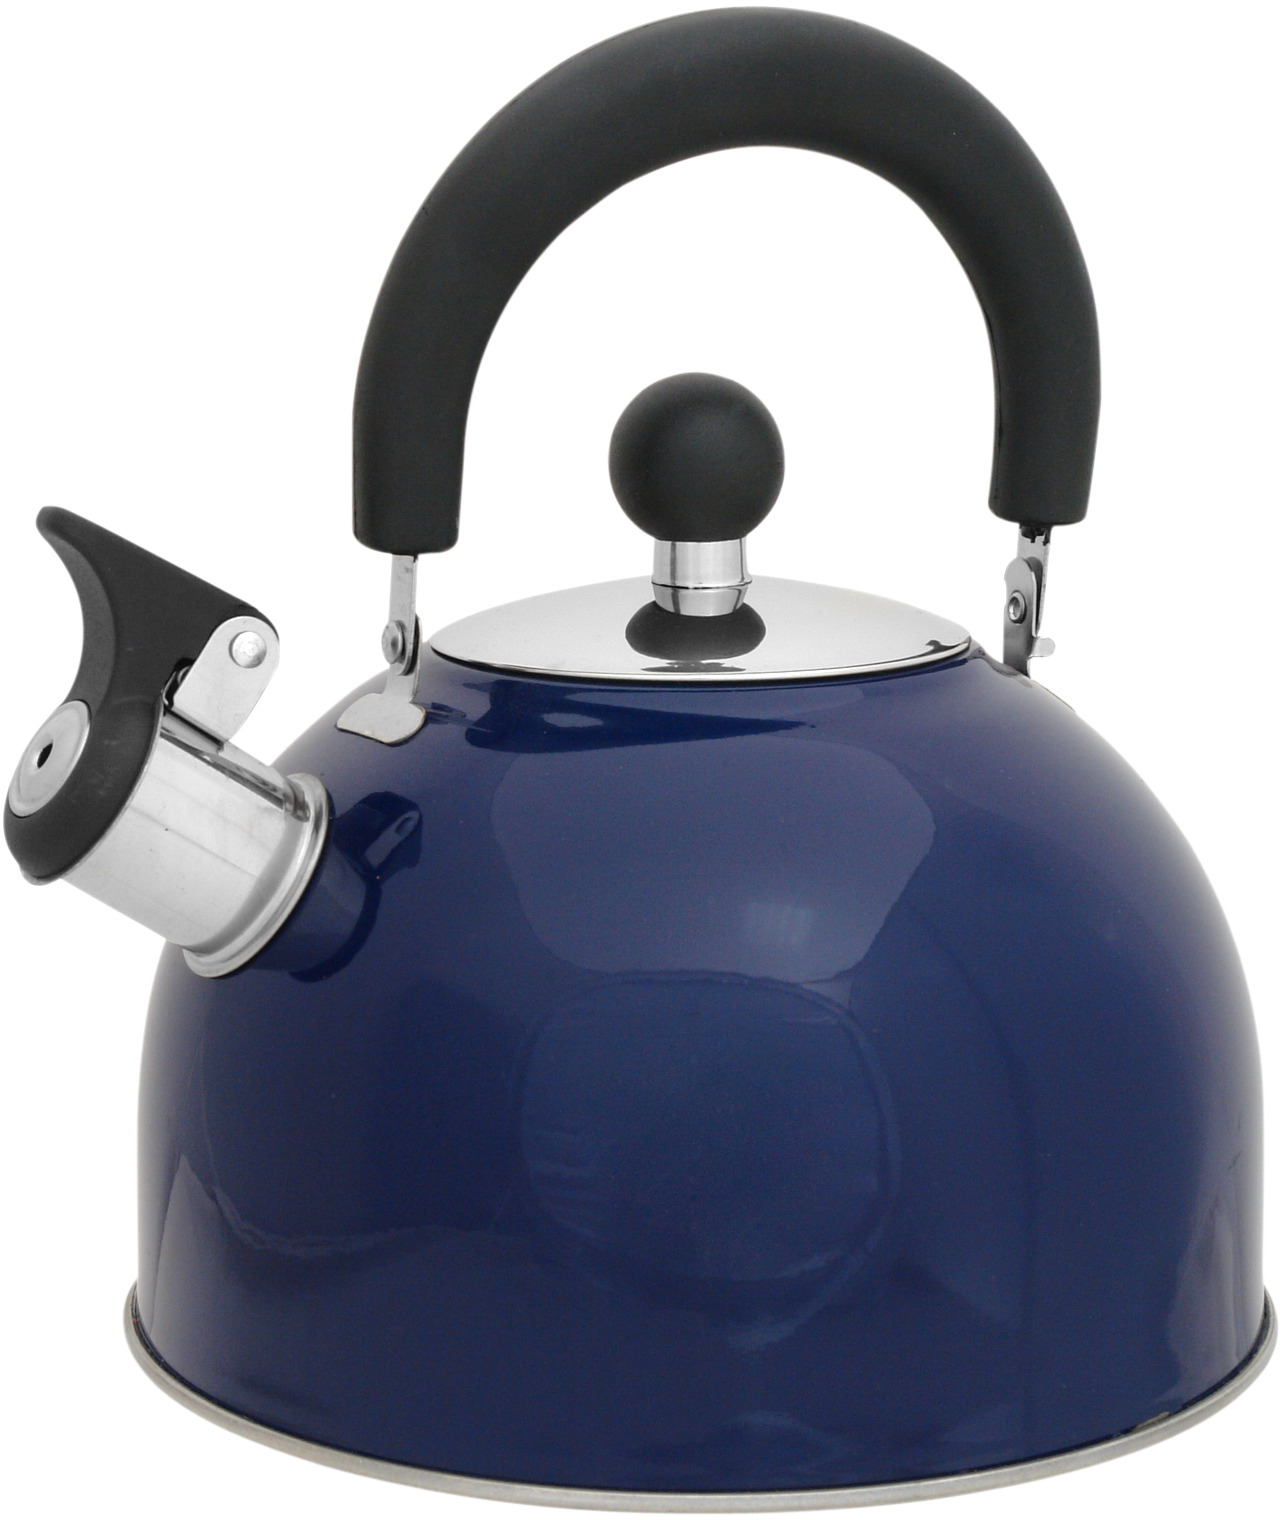 Чайник Mallony MAL-039-B, со свистком, цвет: синий, 2,5 л чайник mallony mal 105 n 3л нерж сталь цельнометал со свистком черный